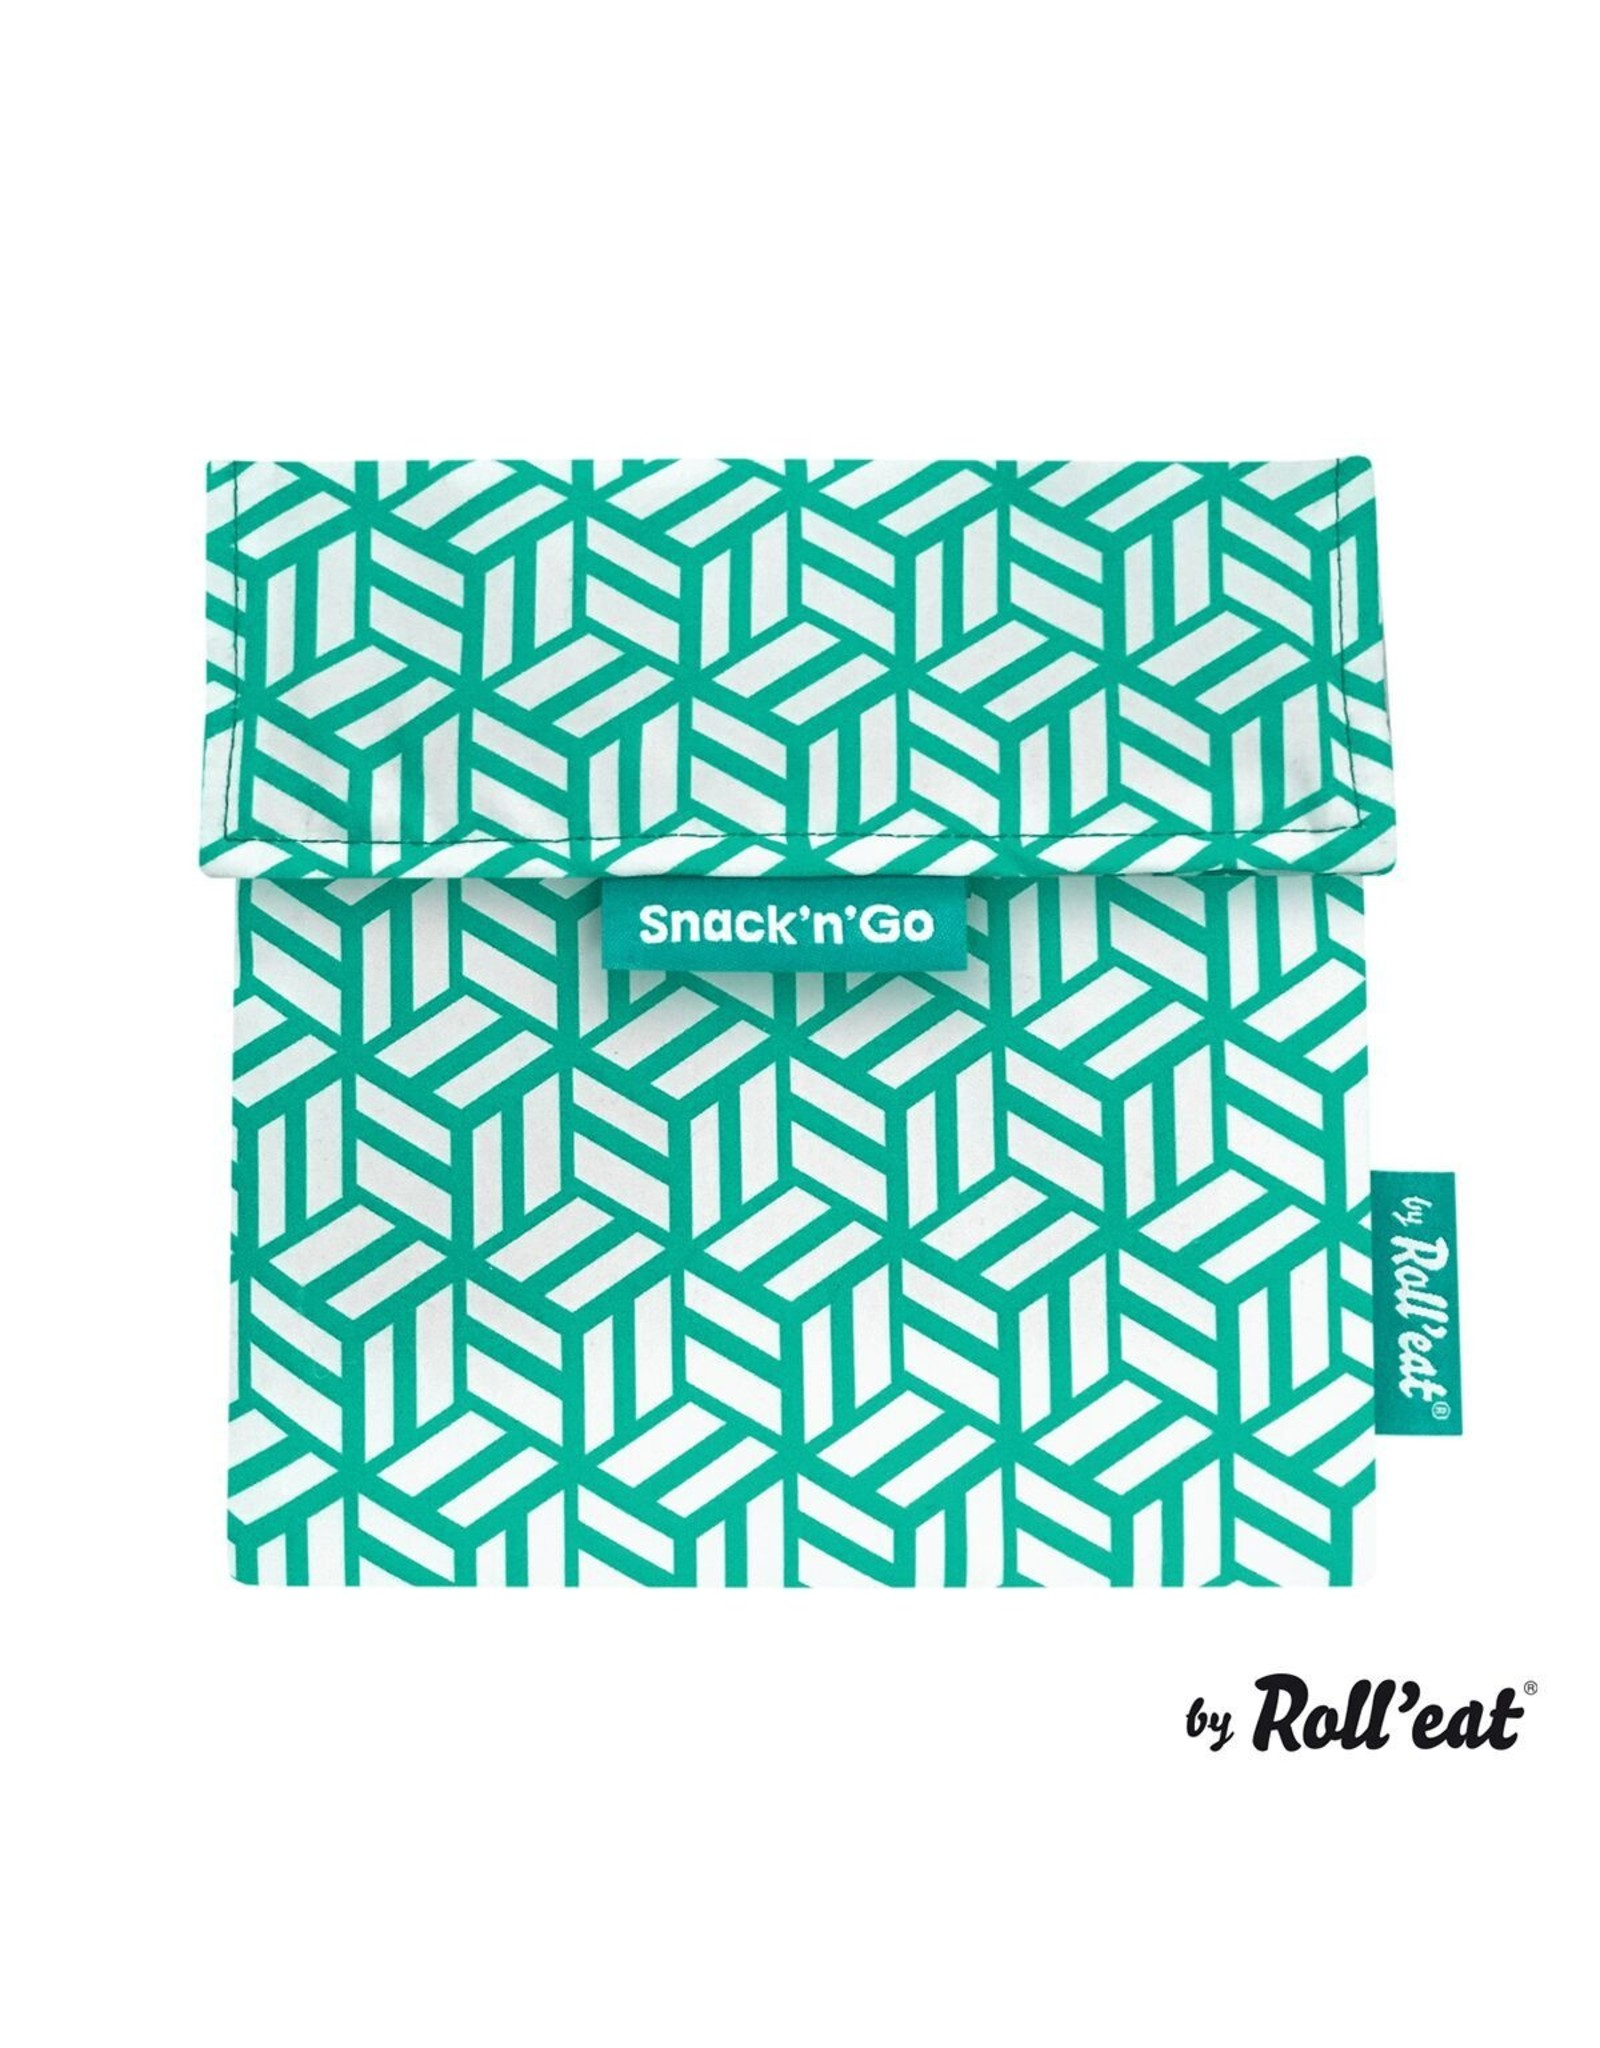 Roll'eat: Snack'n'Go grafisch groen